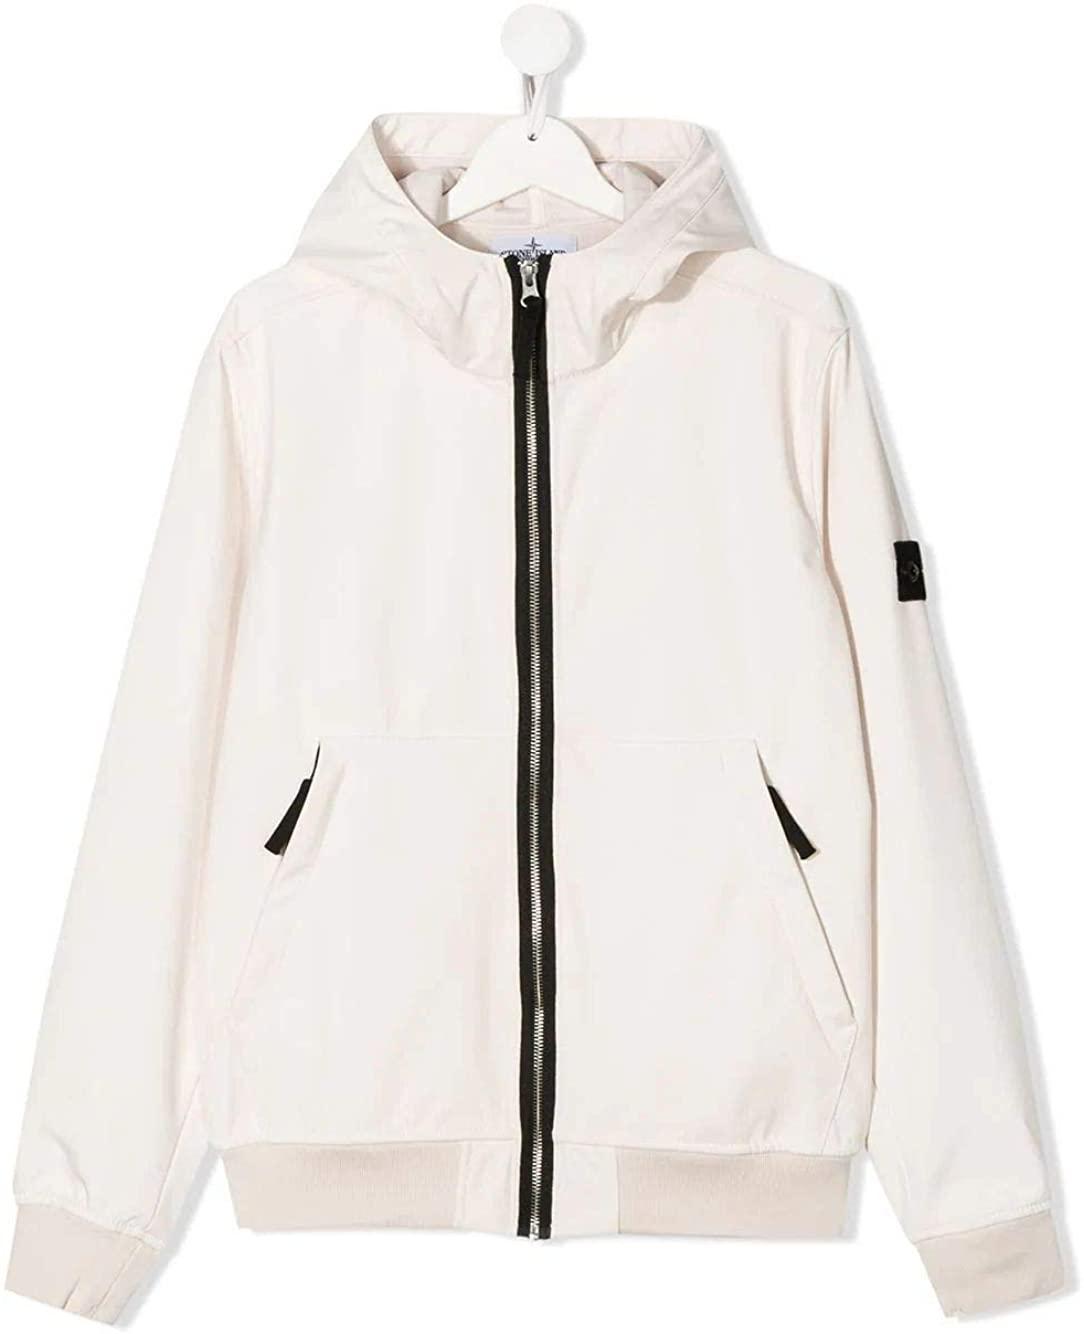 Stone Island Luxury Fashion Boy 721640734V0097 White Polyester Outerwear Jacket | Spring Summer 20